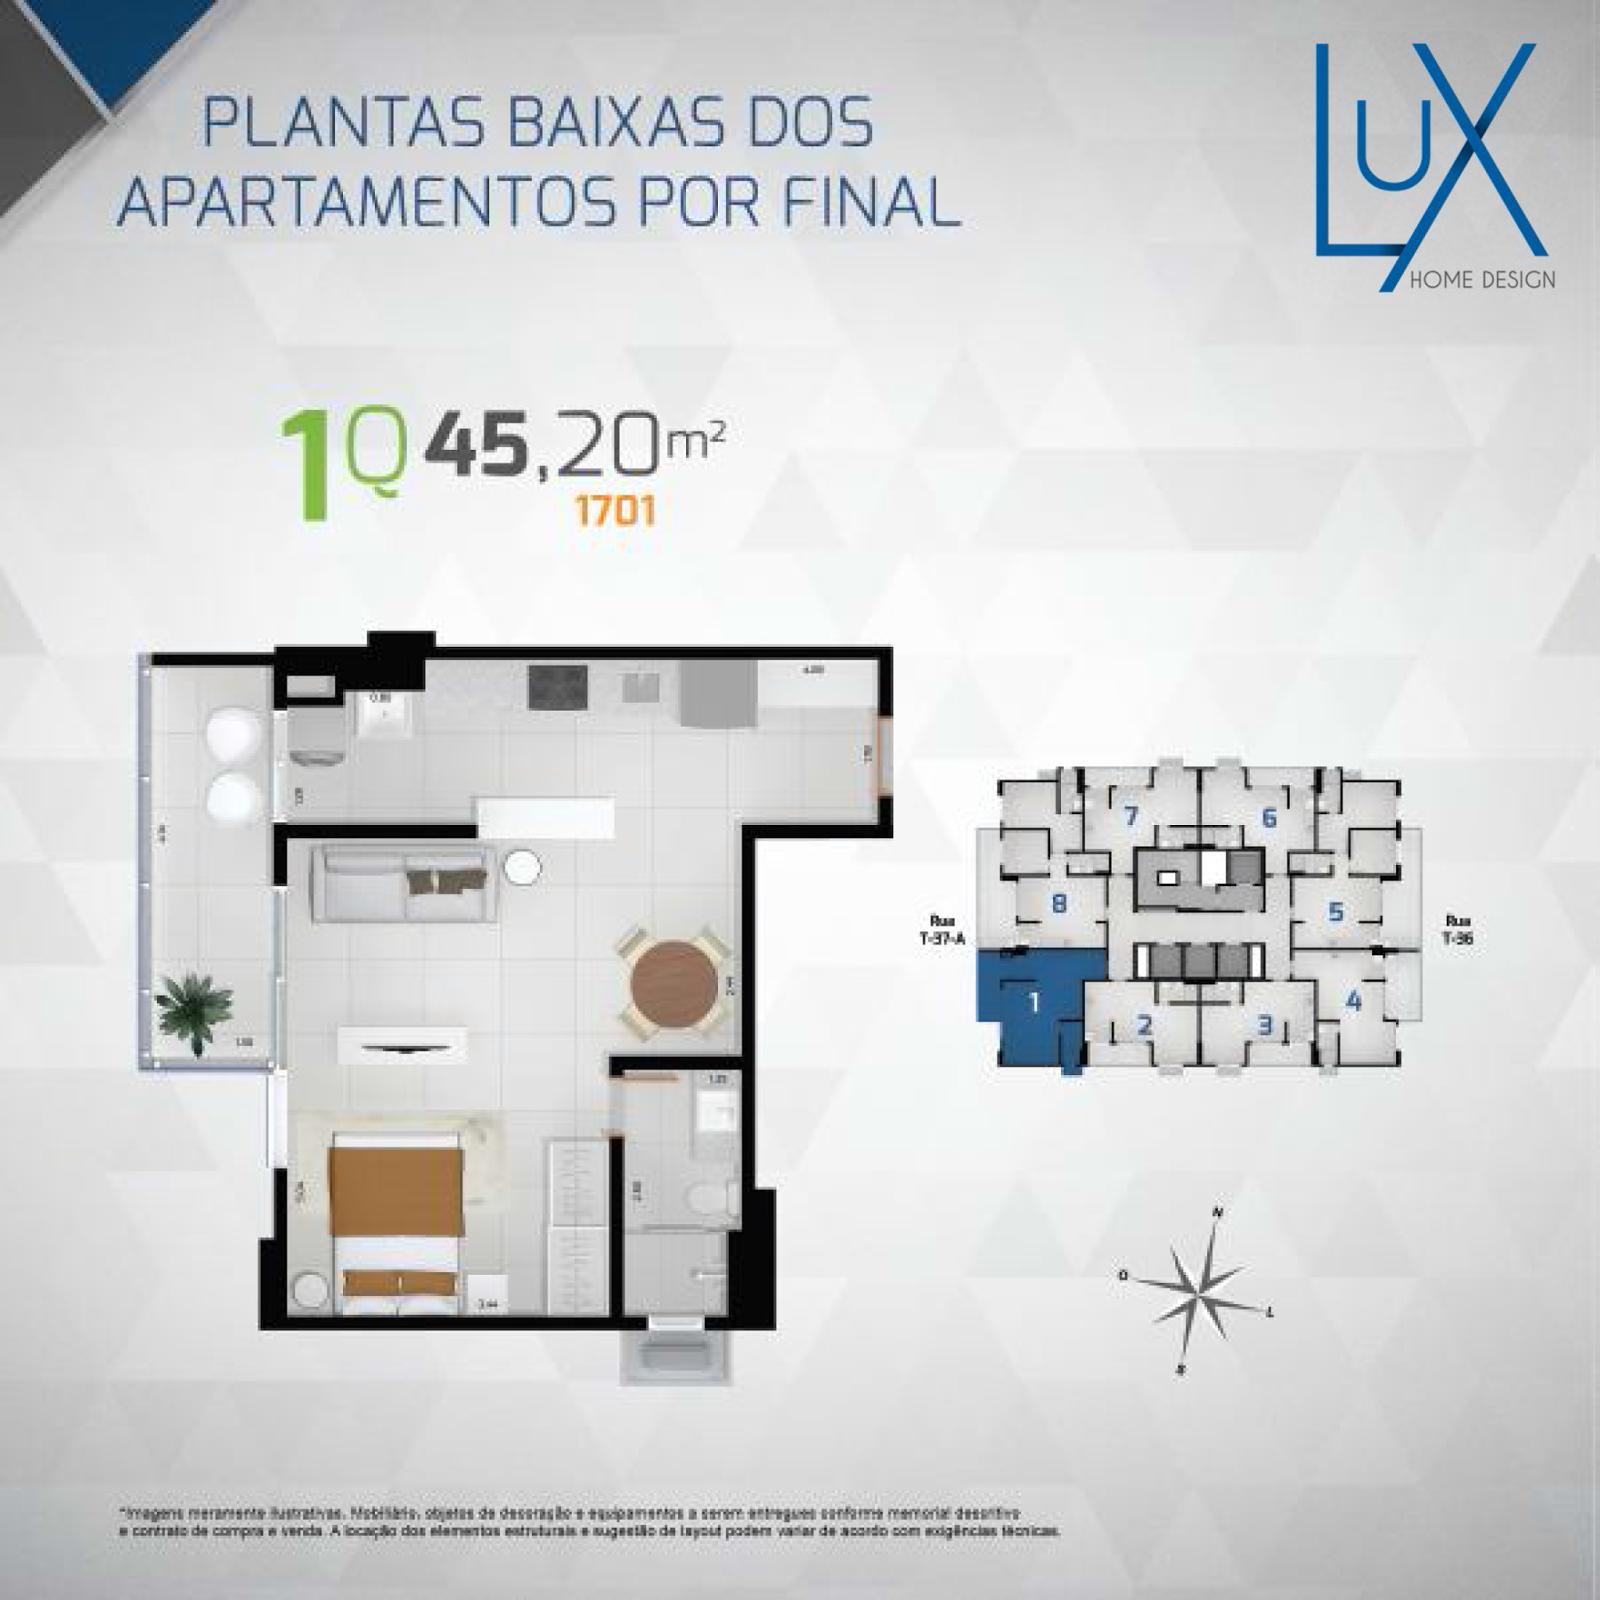 Luxe home design goiania home review co Ryan moe home design reviews